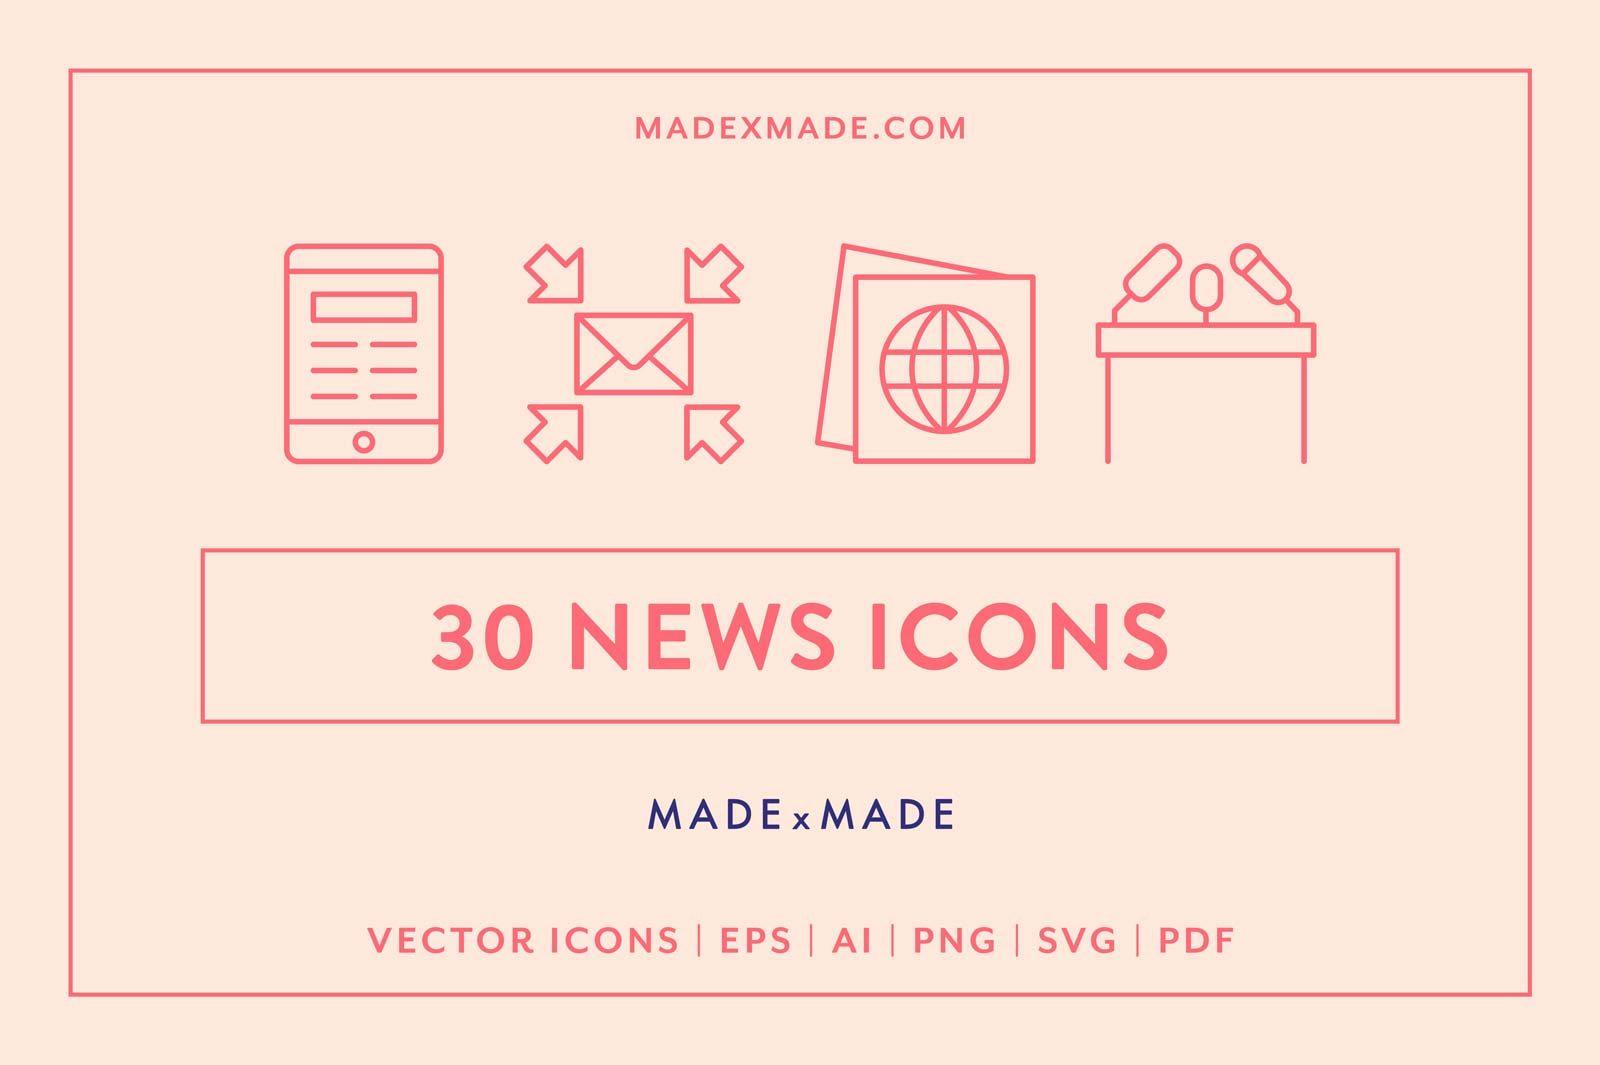 made x made icons news